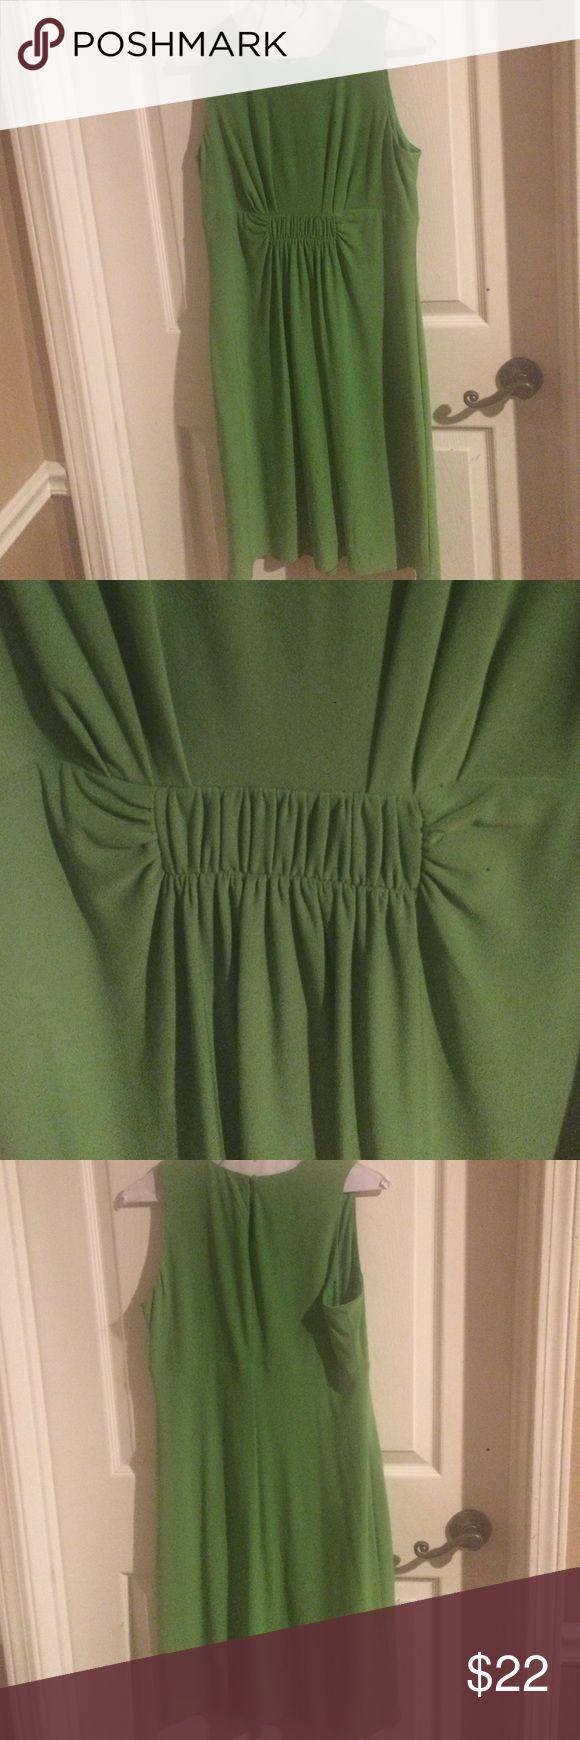 Green sleeveless dress Green, sleeveless dress, size 8, animal & smoke free home Evan Picone Dresses Mini